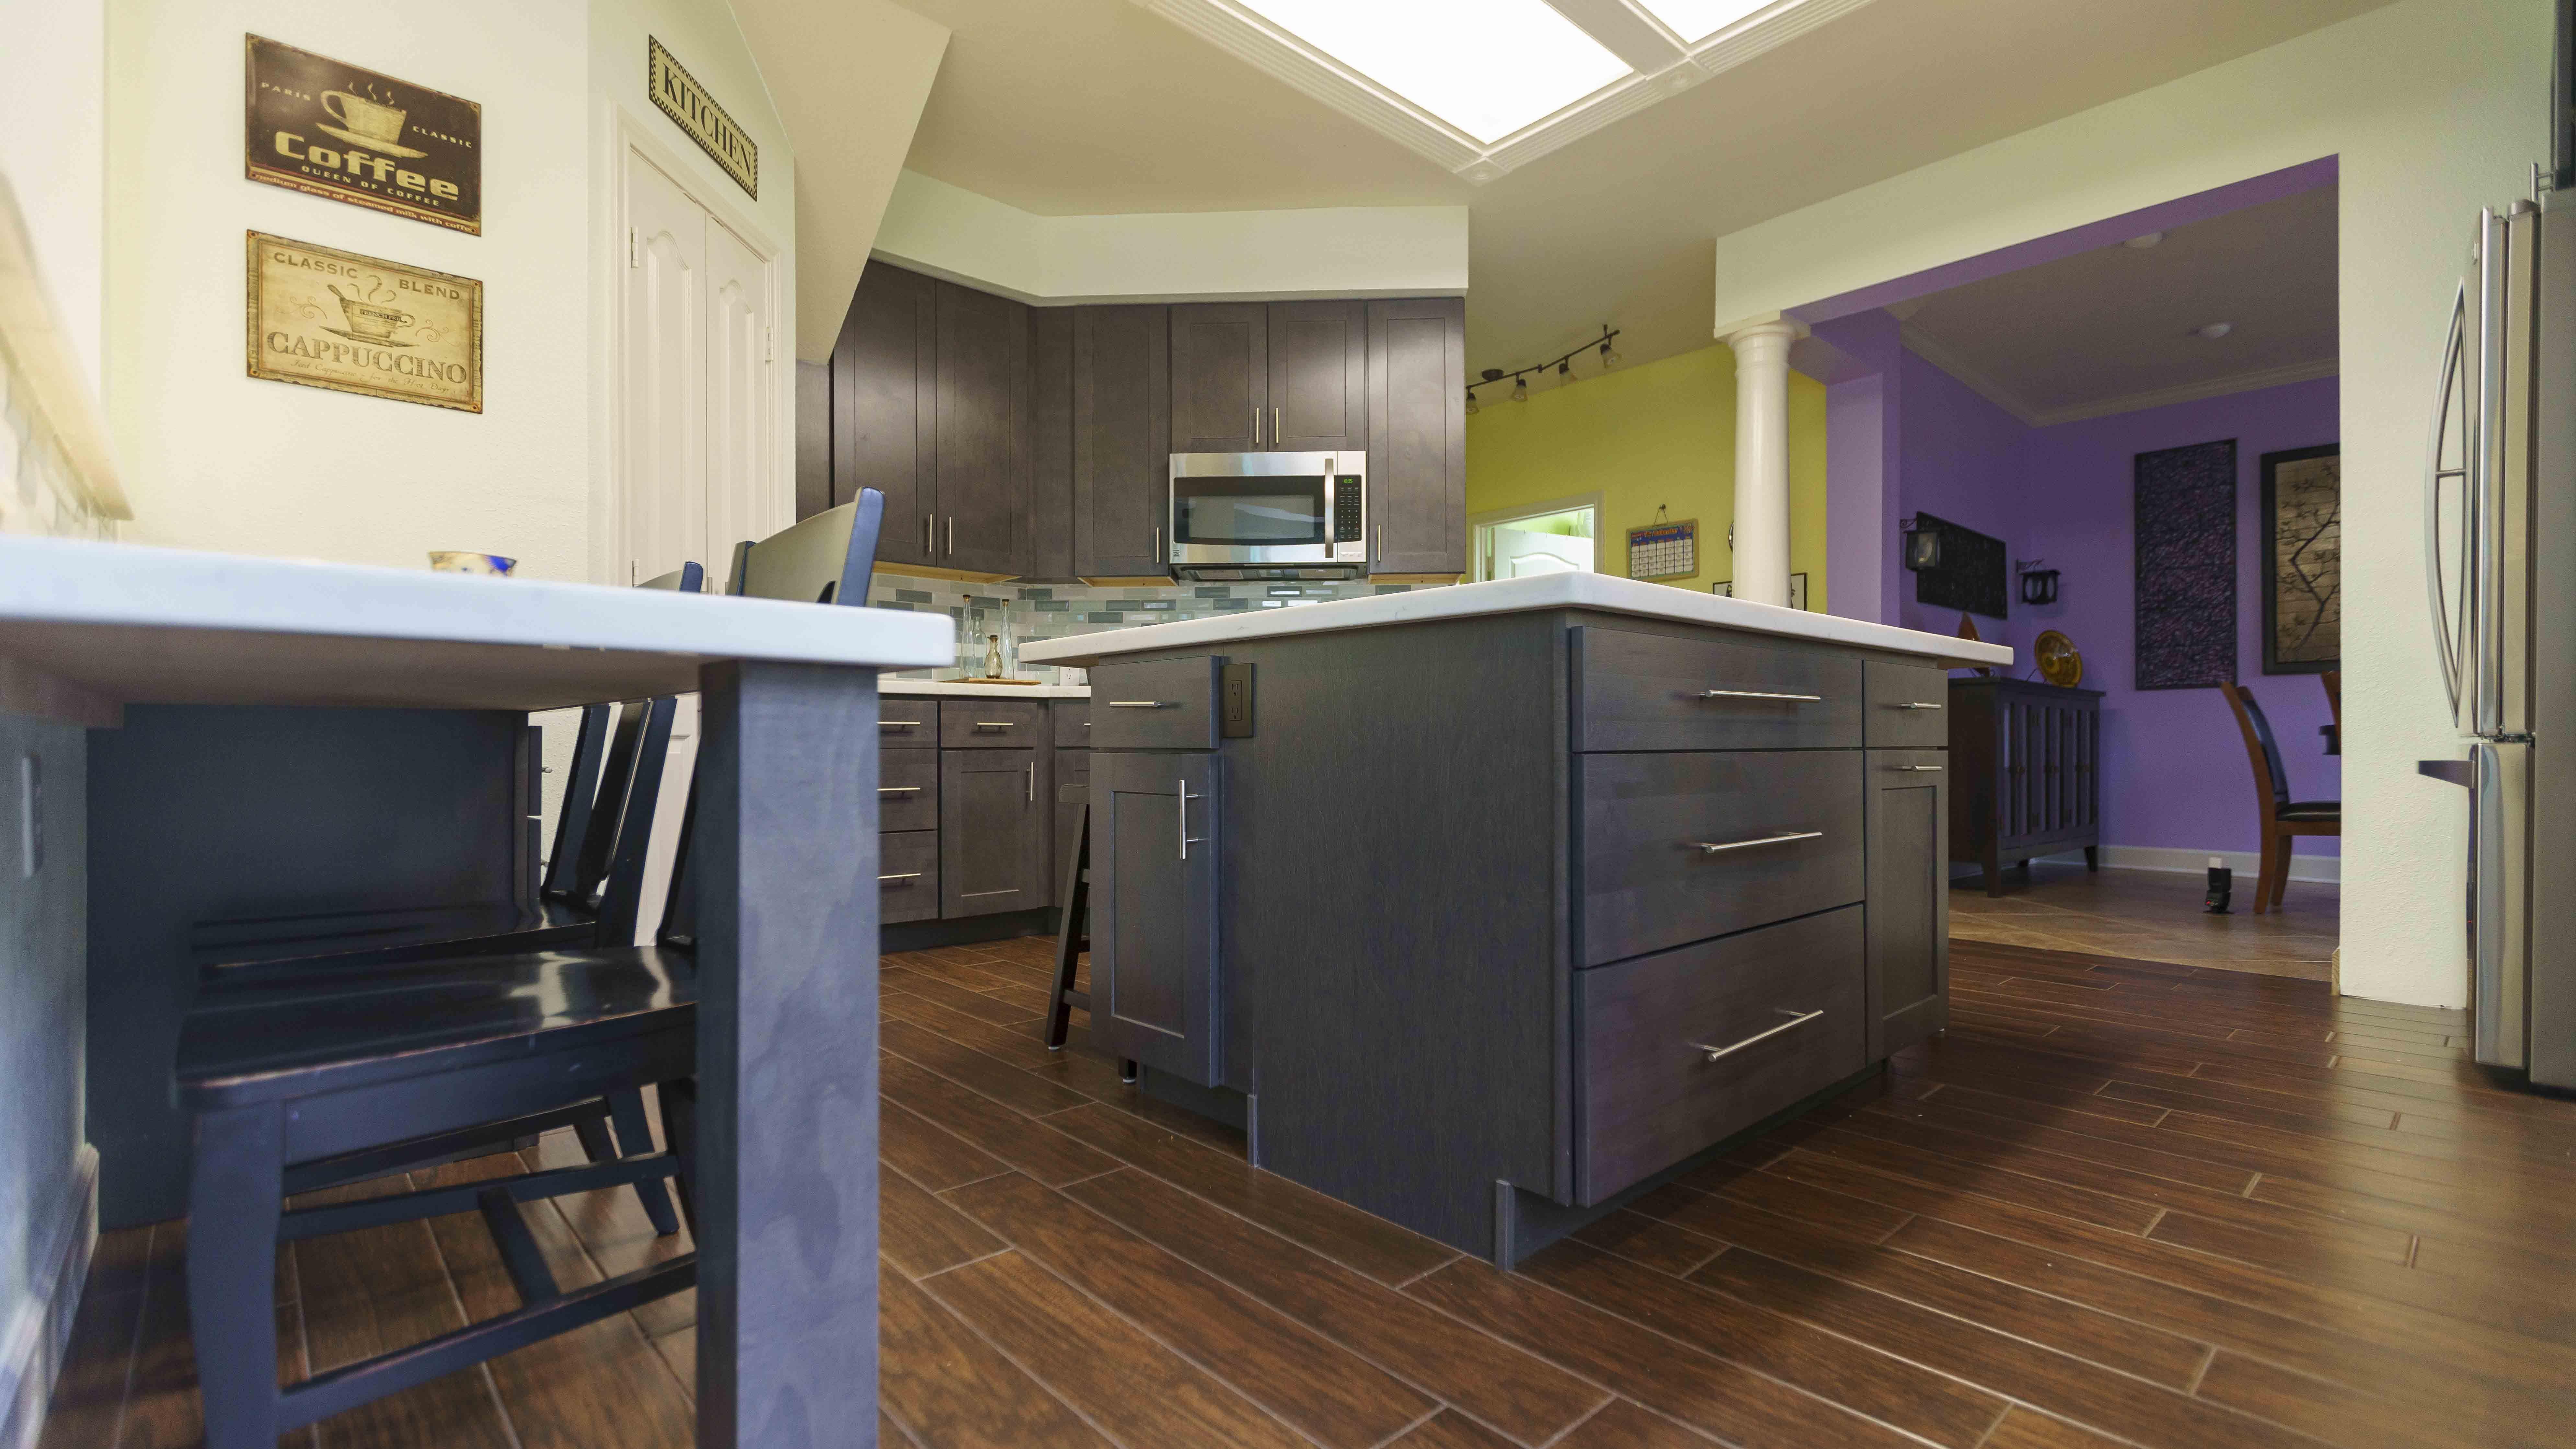 Kitchen Remodeling Houston Tx Bath Remodelling Usa Cabinet Store Kitchen Bar Stools Kitchen Remodel Kitchen Decor